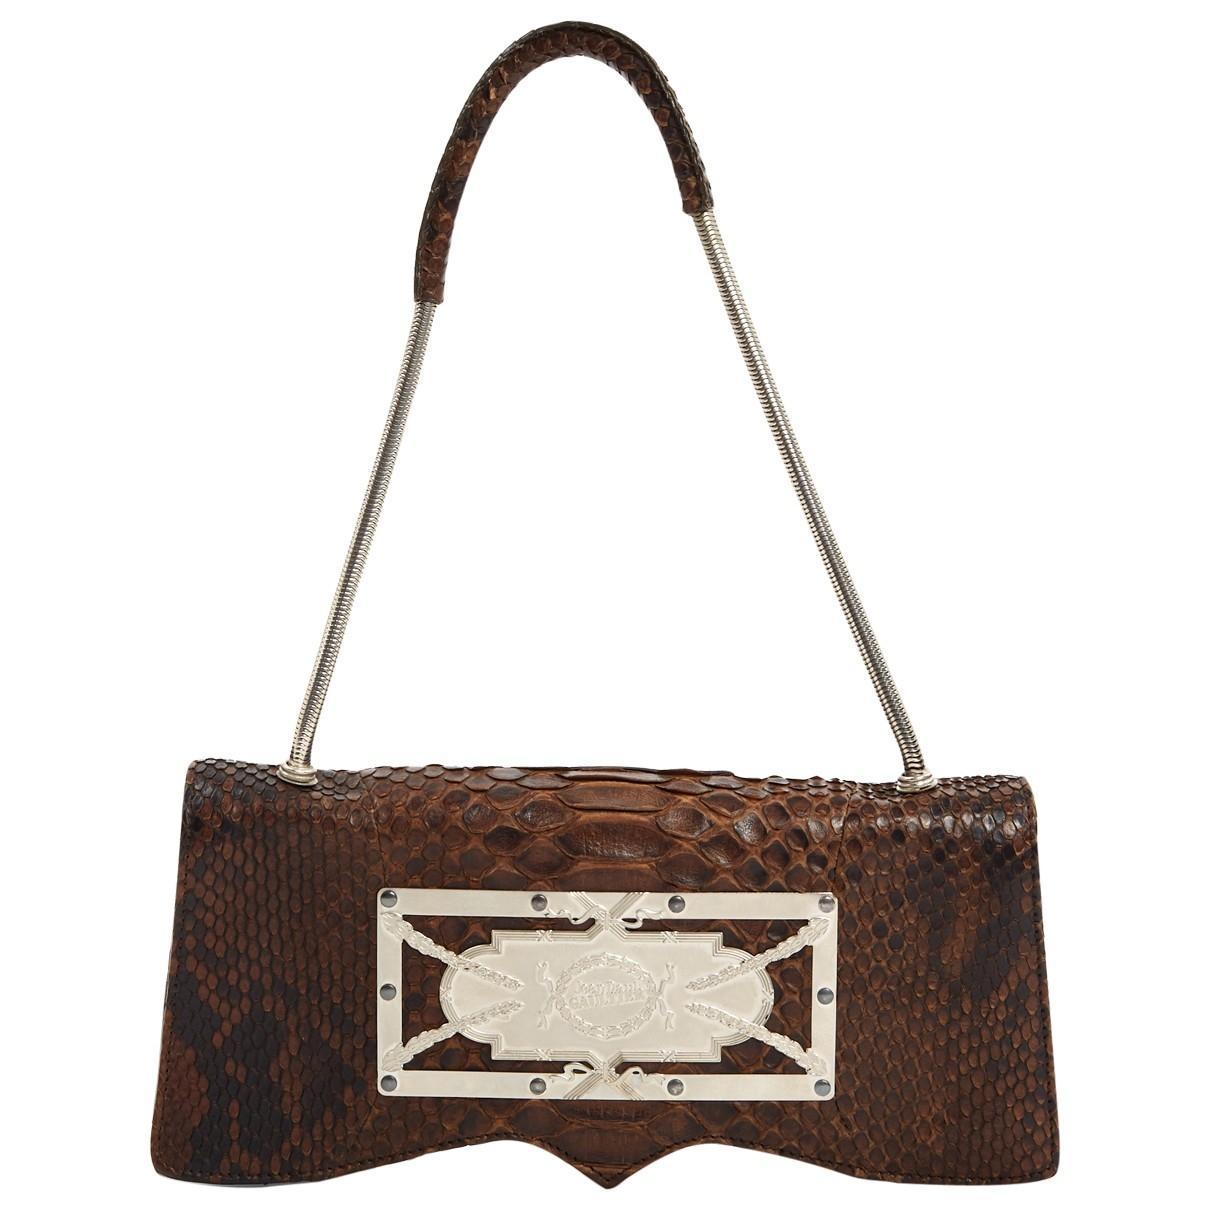 b4f75e3e2a Lyst - Jean Paul Gaultier Brown Python Clutch Bag in Brown